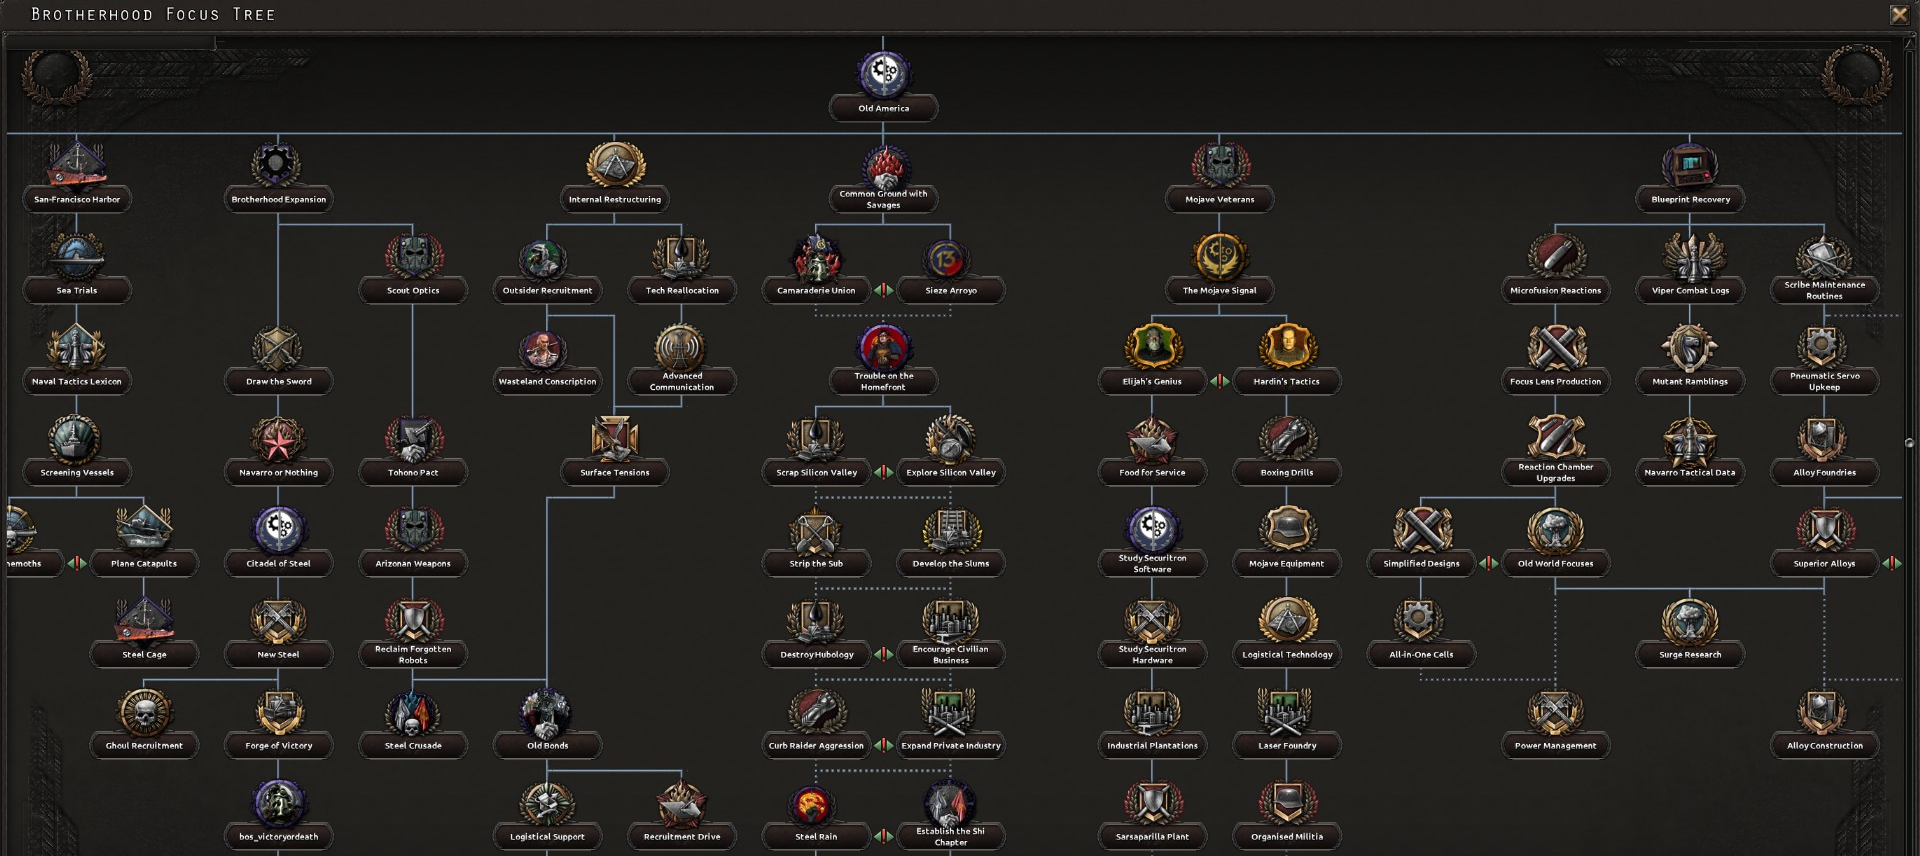 Amazing Report RSS Brotherhood Tree (view Original)